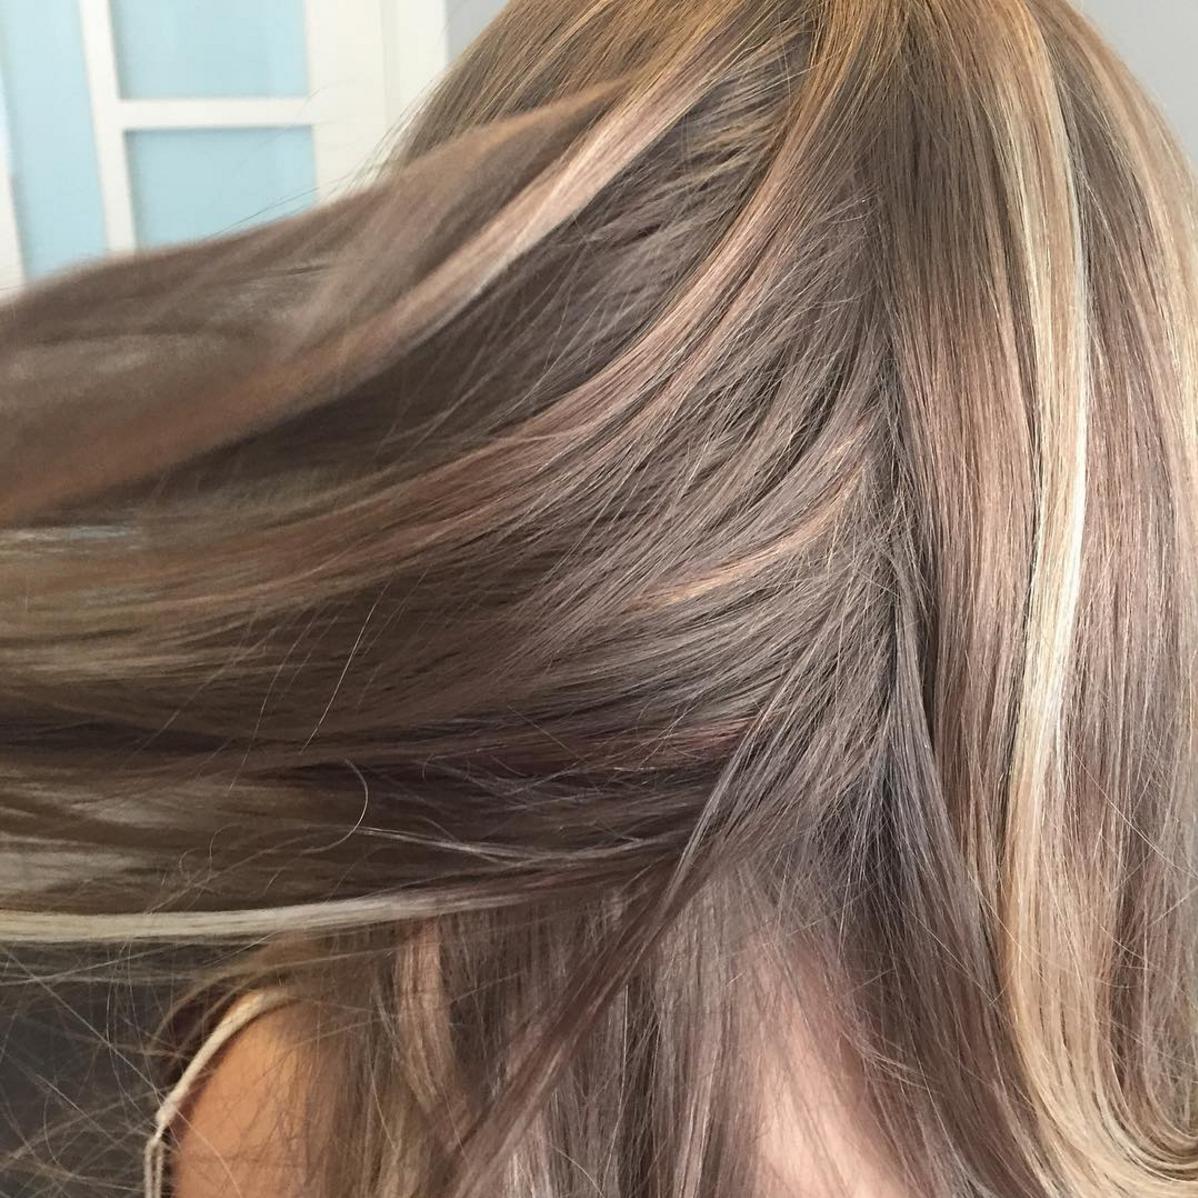 secret veil hair extensions back side view.png